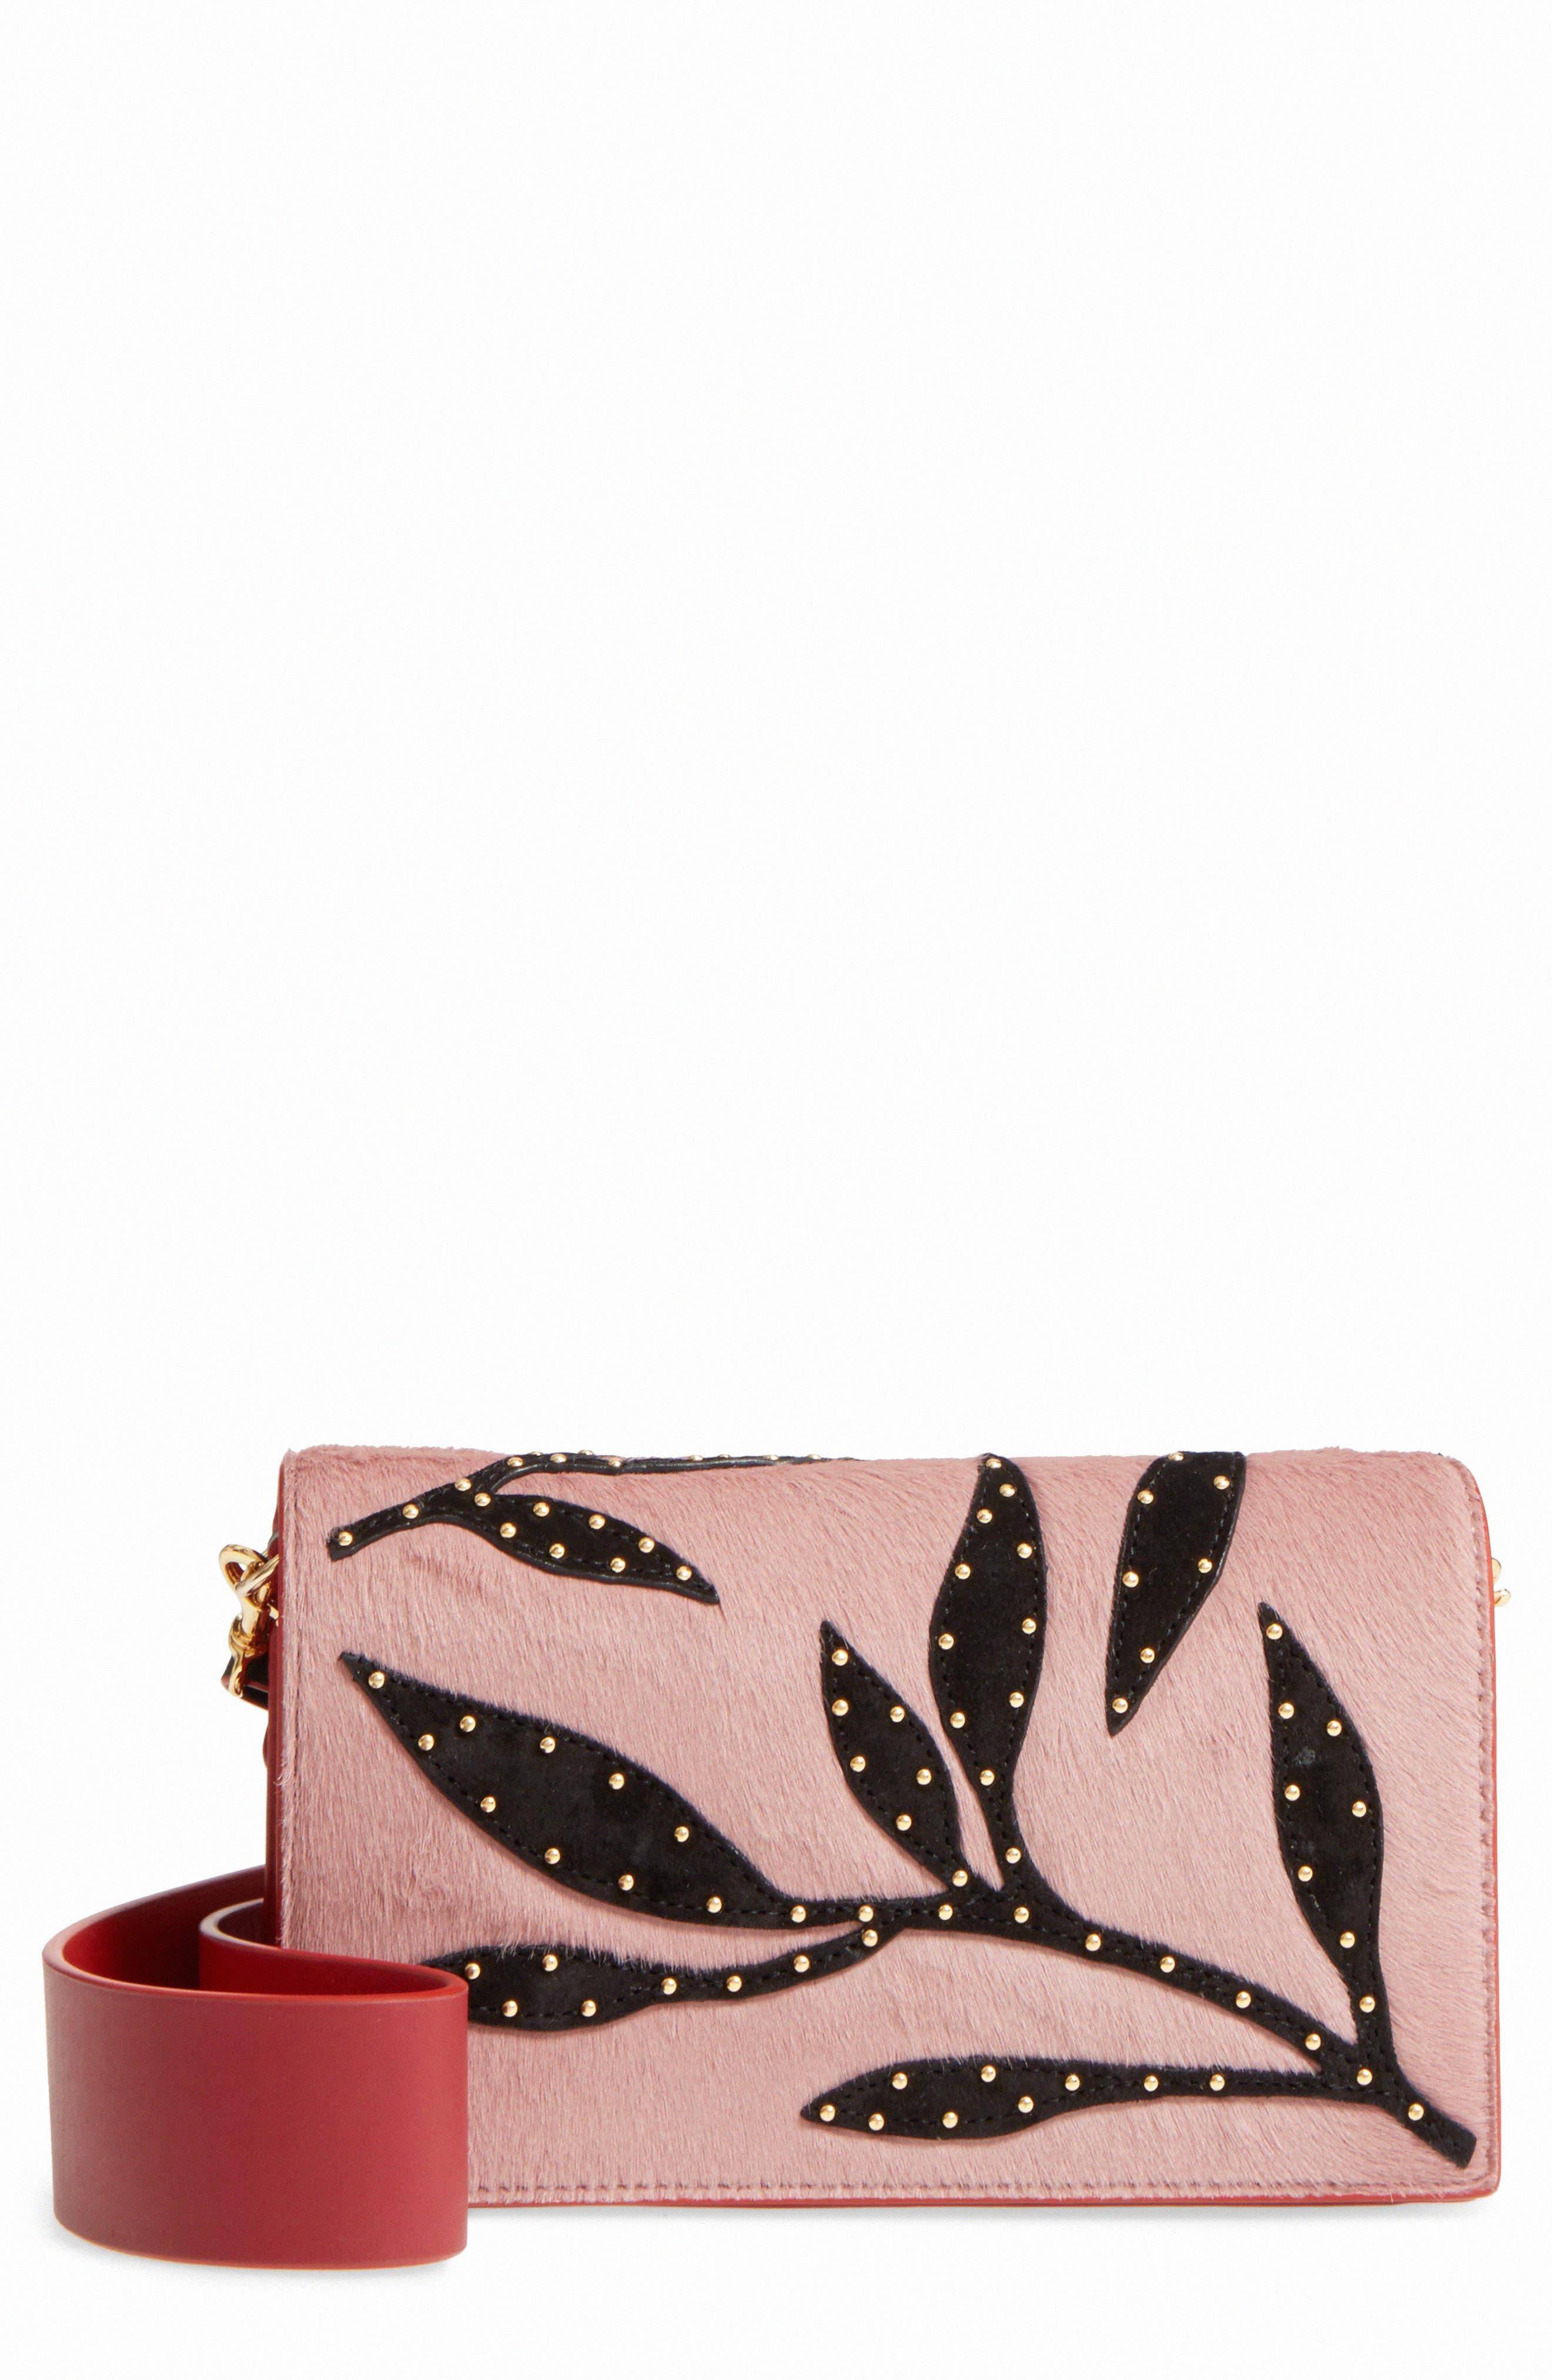 Soirée Genuine Calf Hair & Leather Convertible Shoulder Bag,                             Main thumbnail 1, color,                             537